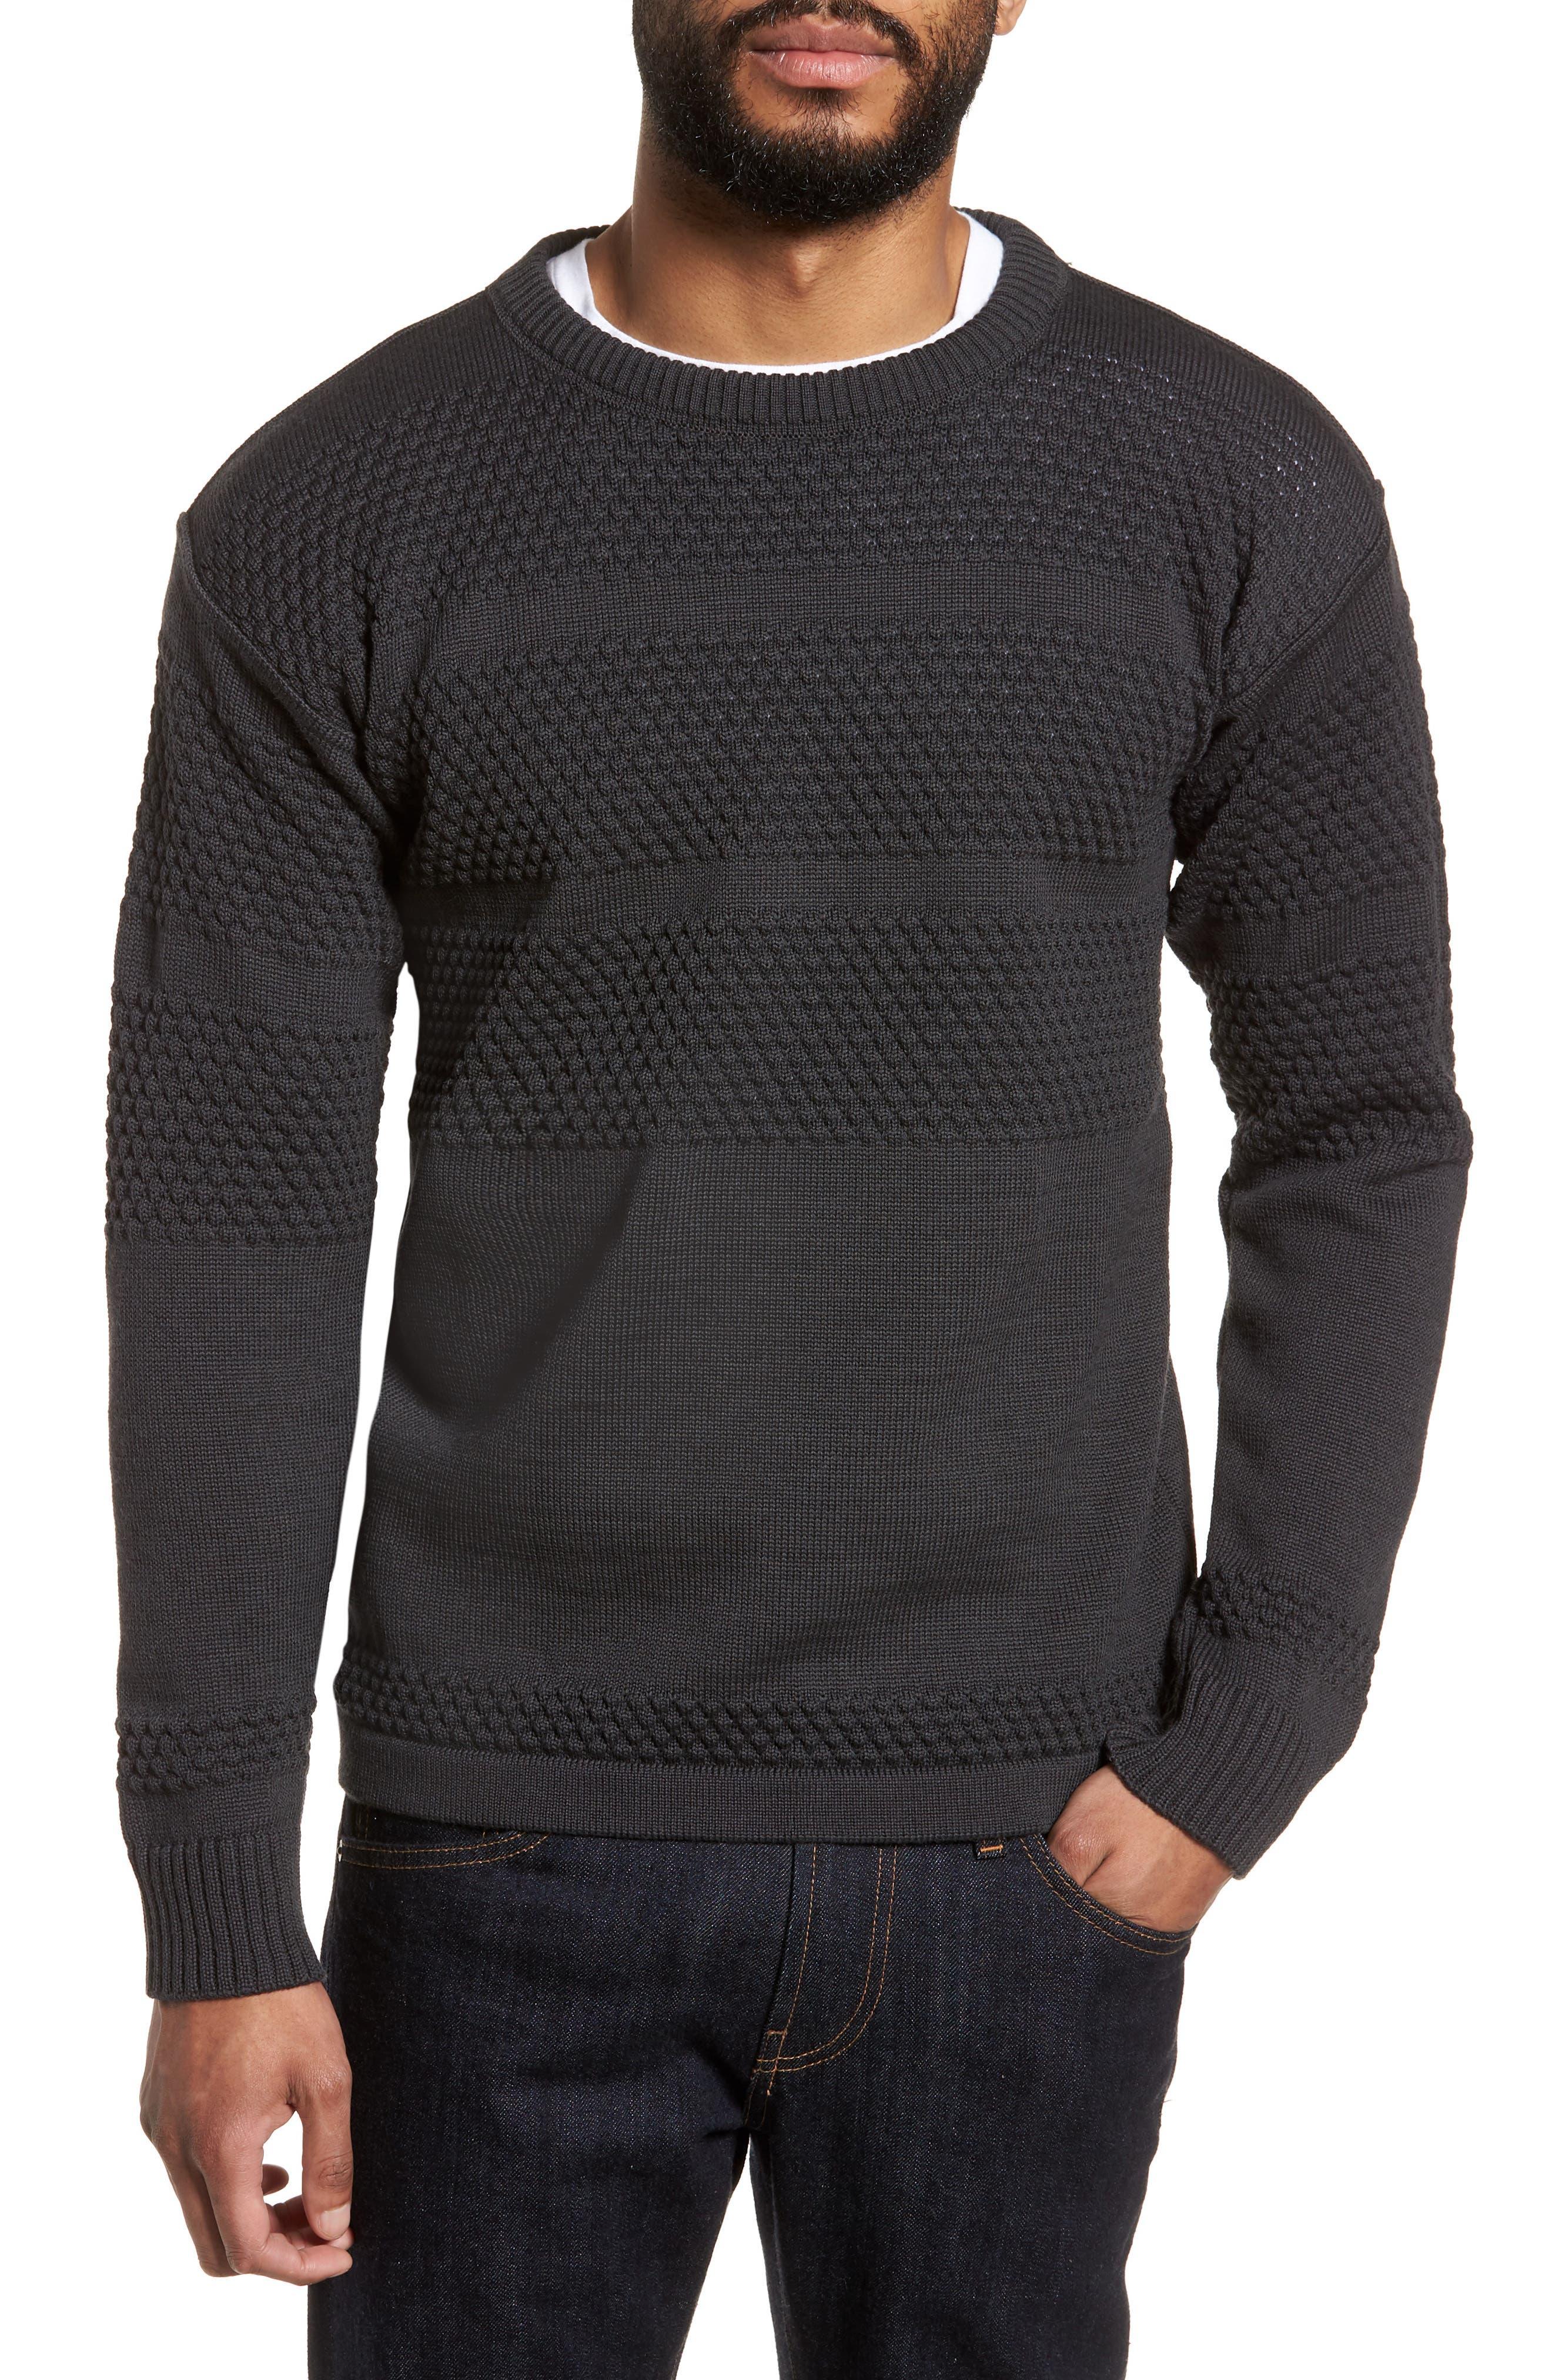 Fisherman Crewneck Wool Sweater,                             Main thumbnail 1, color,                             020